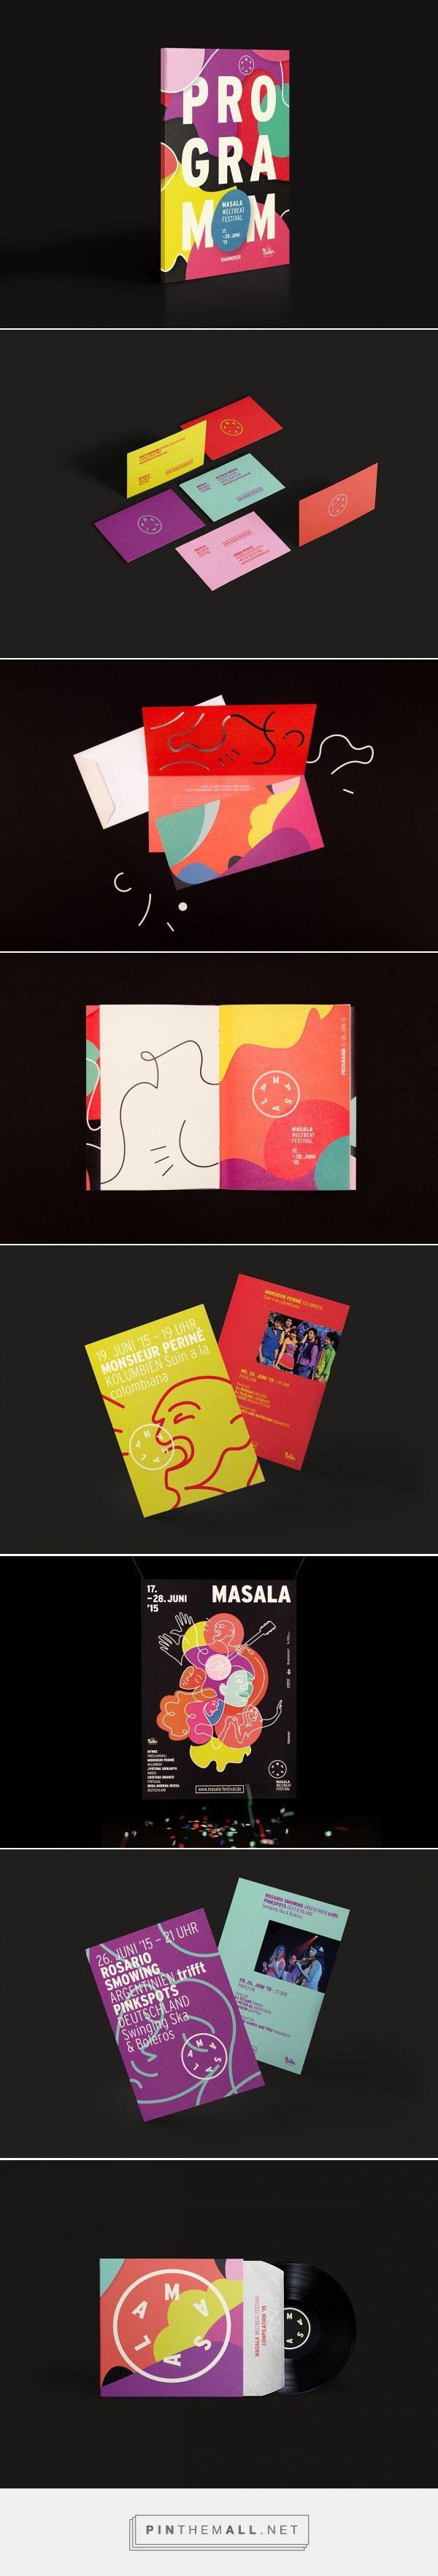 Masala Weltbeat Festival Branding by Hardy Seiler